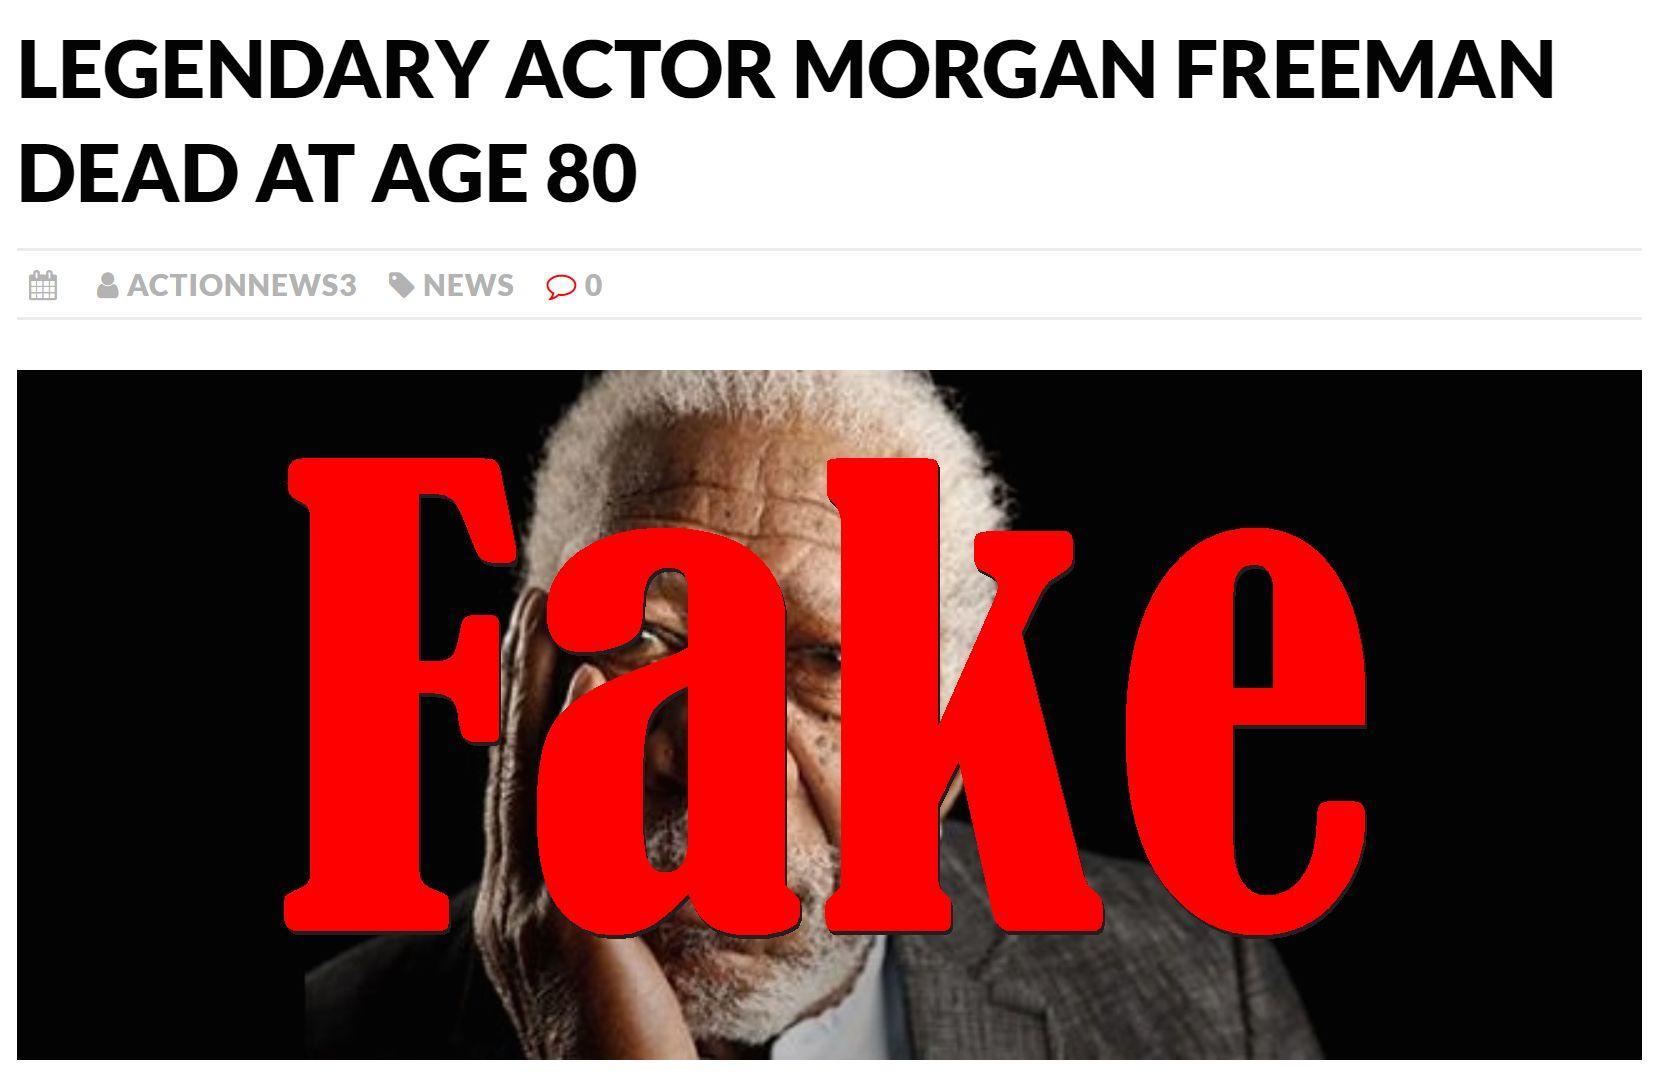 Fake News: Legendary Actor Morgan Freeman NOT Dead At Age 80